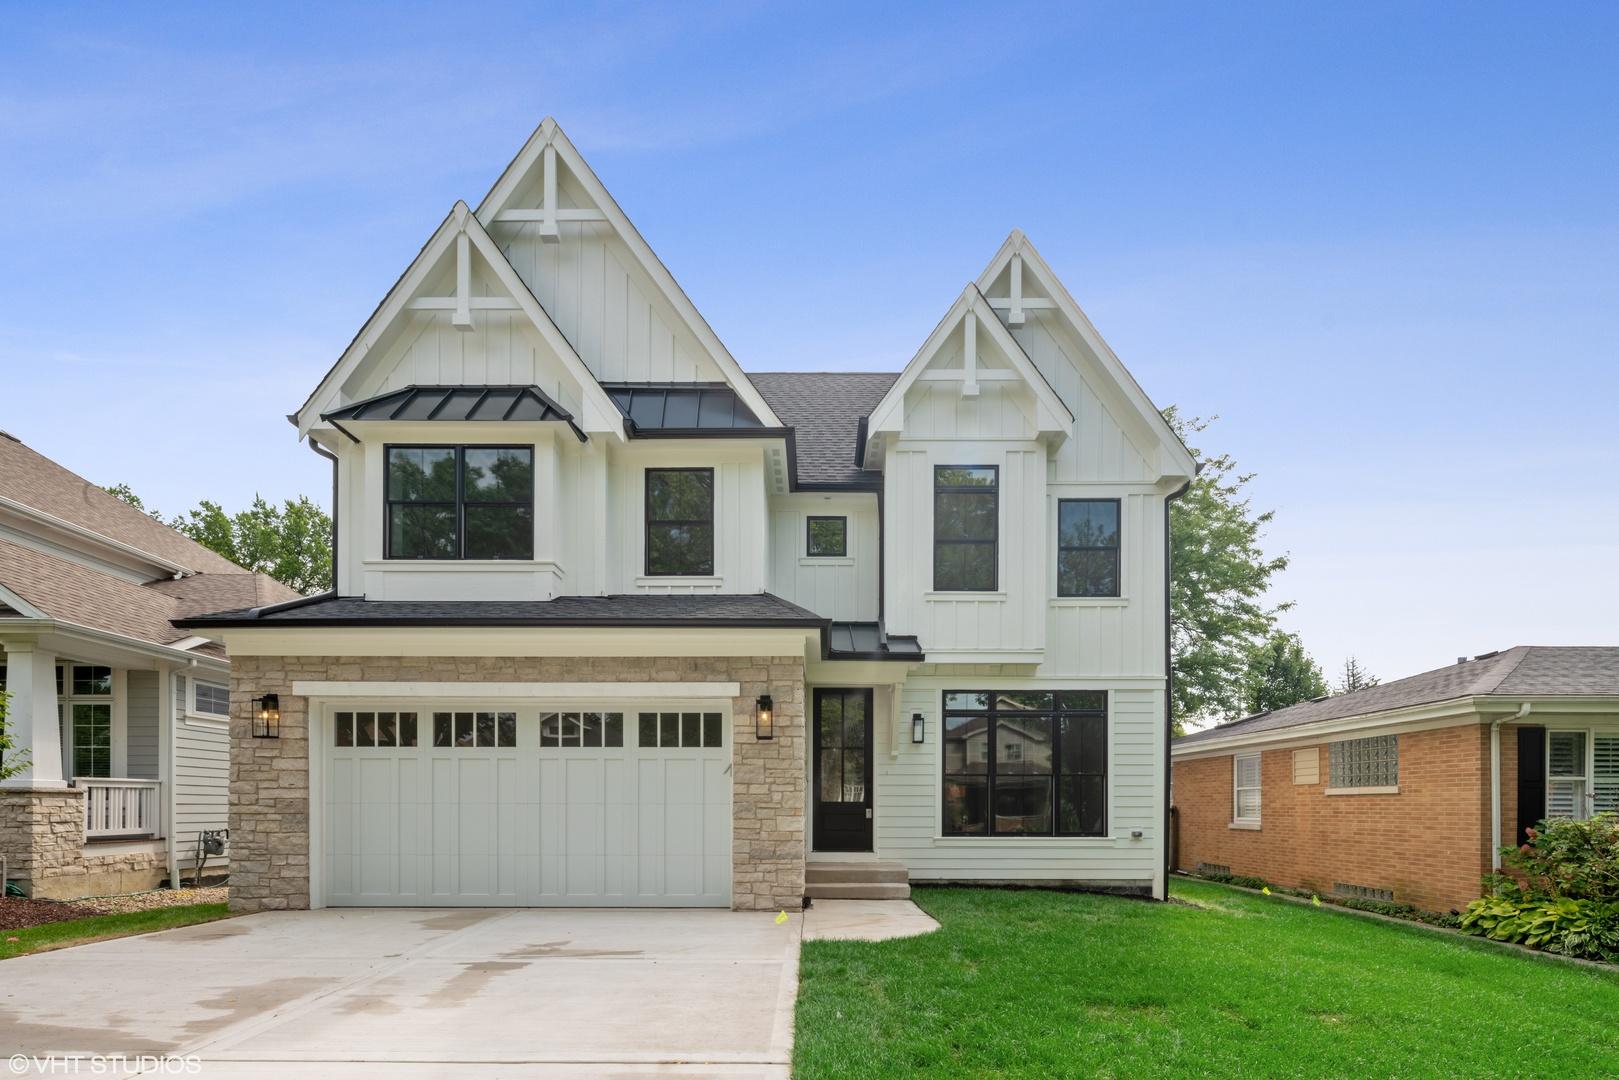 253 Evergreen Avenue Elmhurst, IL 60126